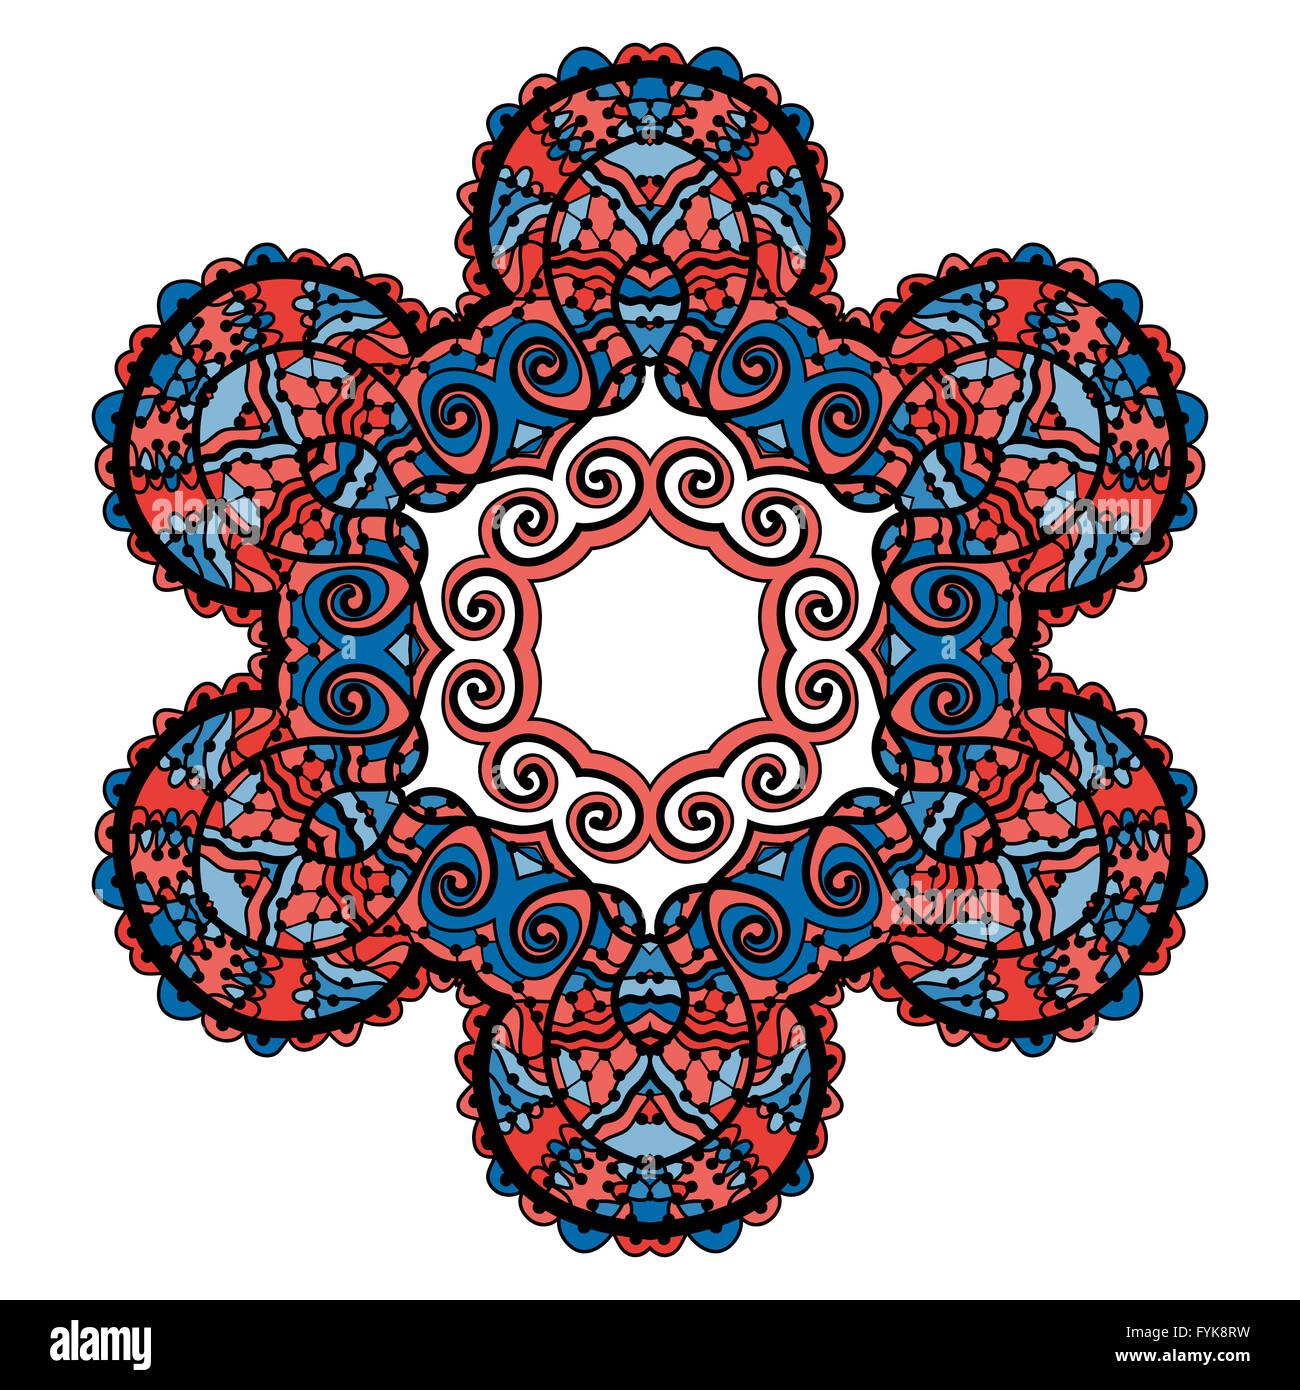 Stylized tribal mandala circle decorative spiritual indian symbol stylized tribal mandala circle decorative spiritual indian symbol of lotus flower round ornament pattern vector illustration izmirmasajfo